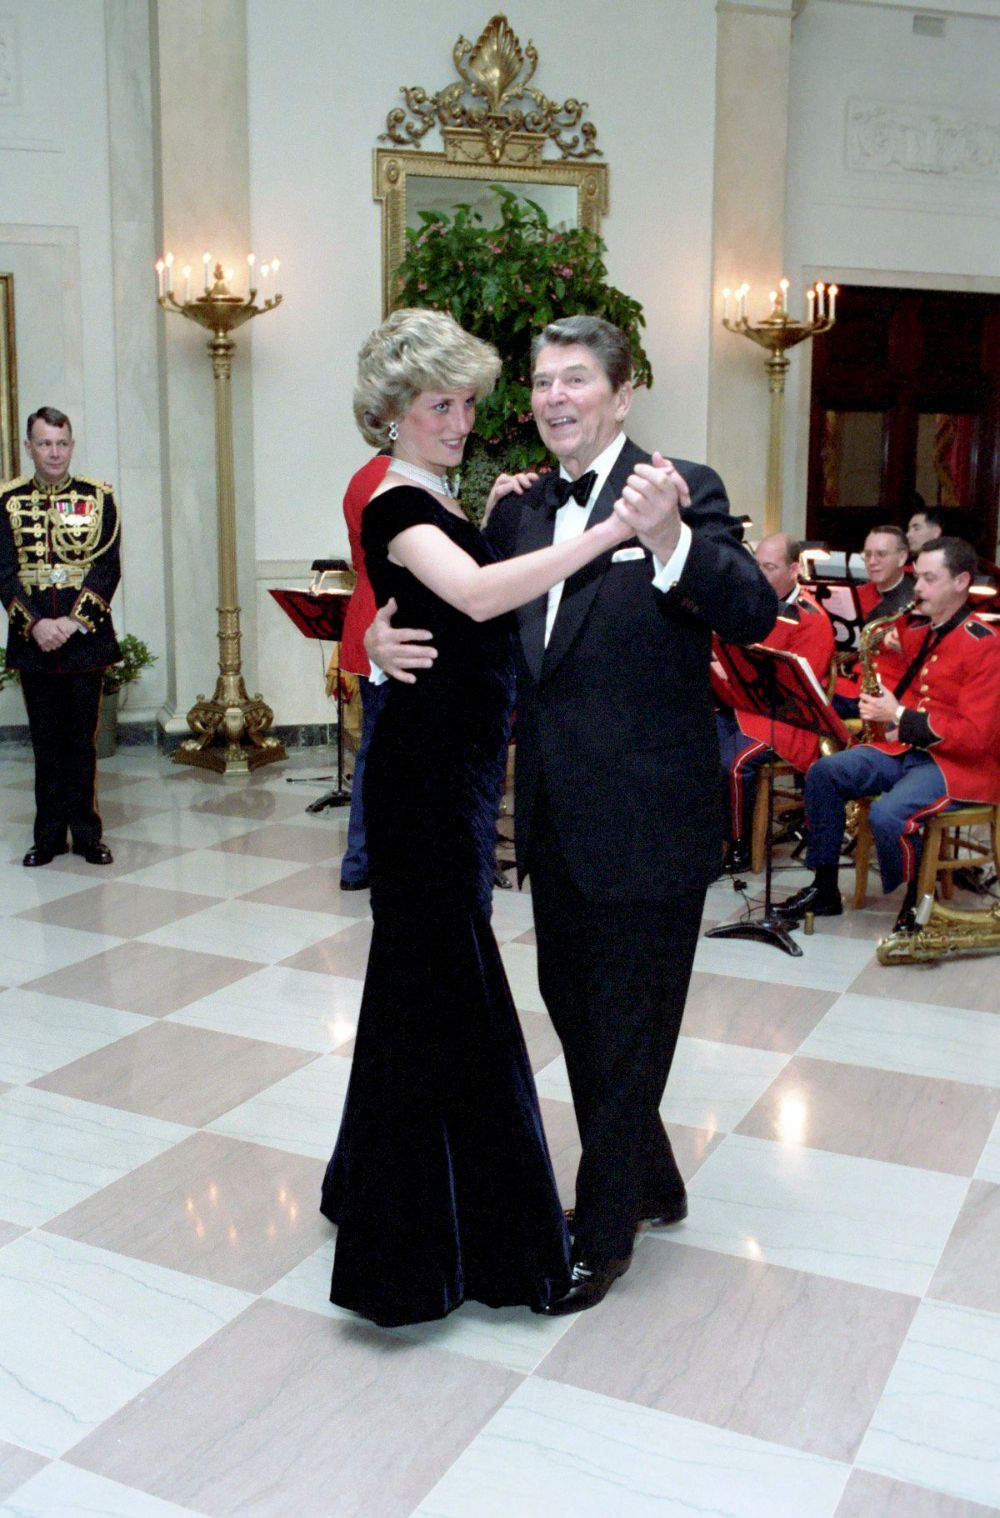 Travolta Dress The Story Behind The Dress Princess Diana